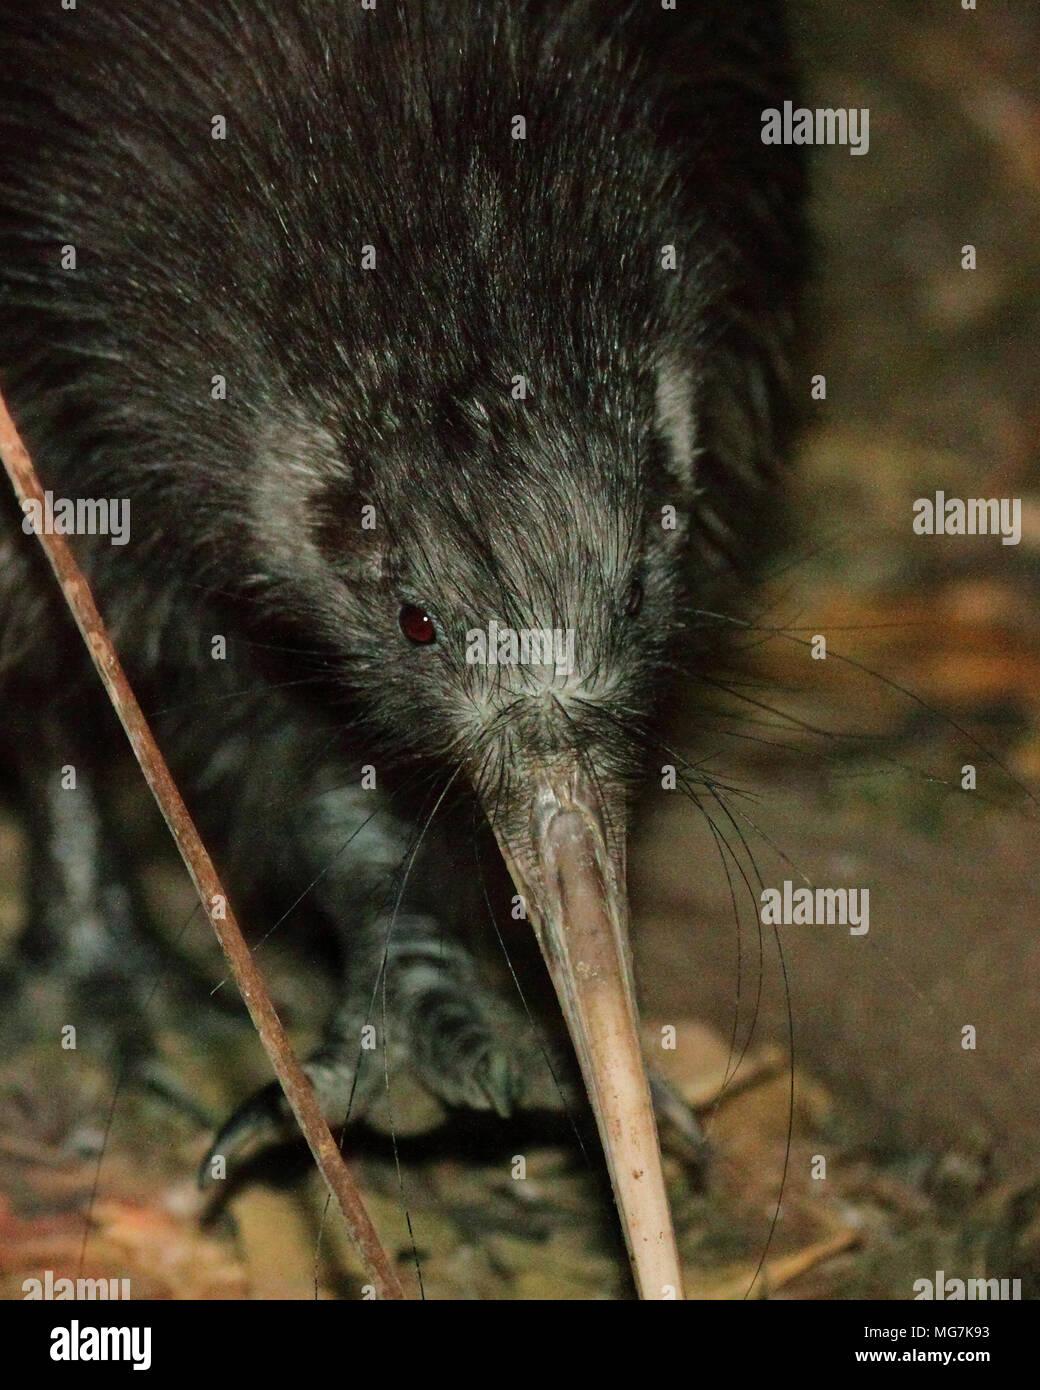 A Brown Kiwi stepping forward. - Stock Image